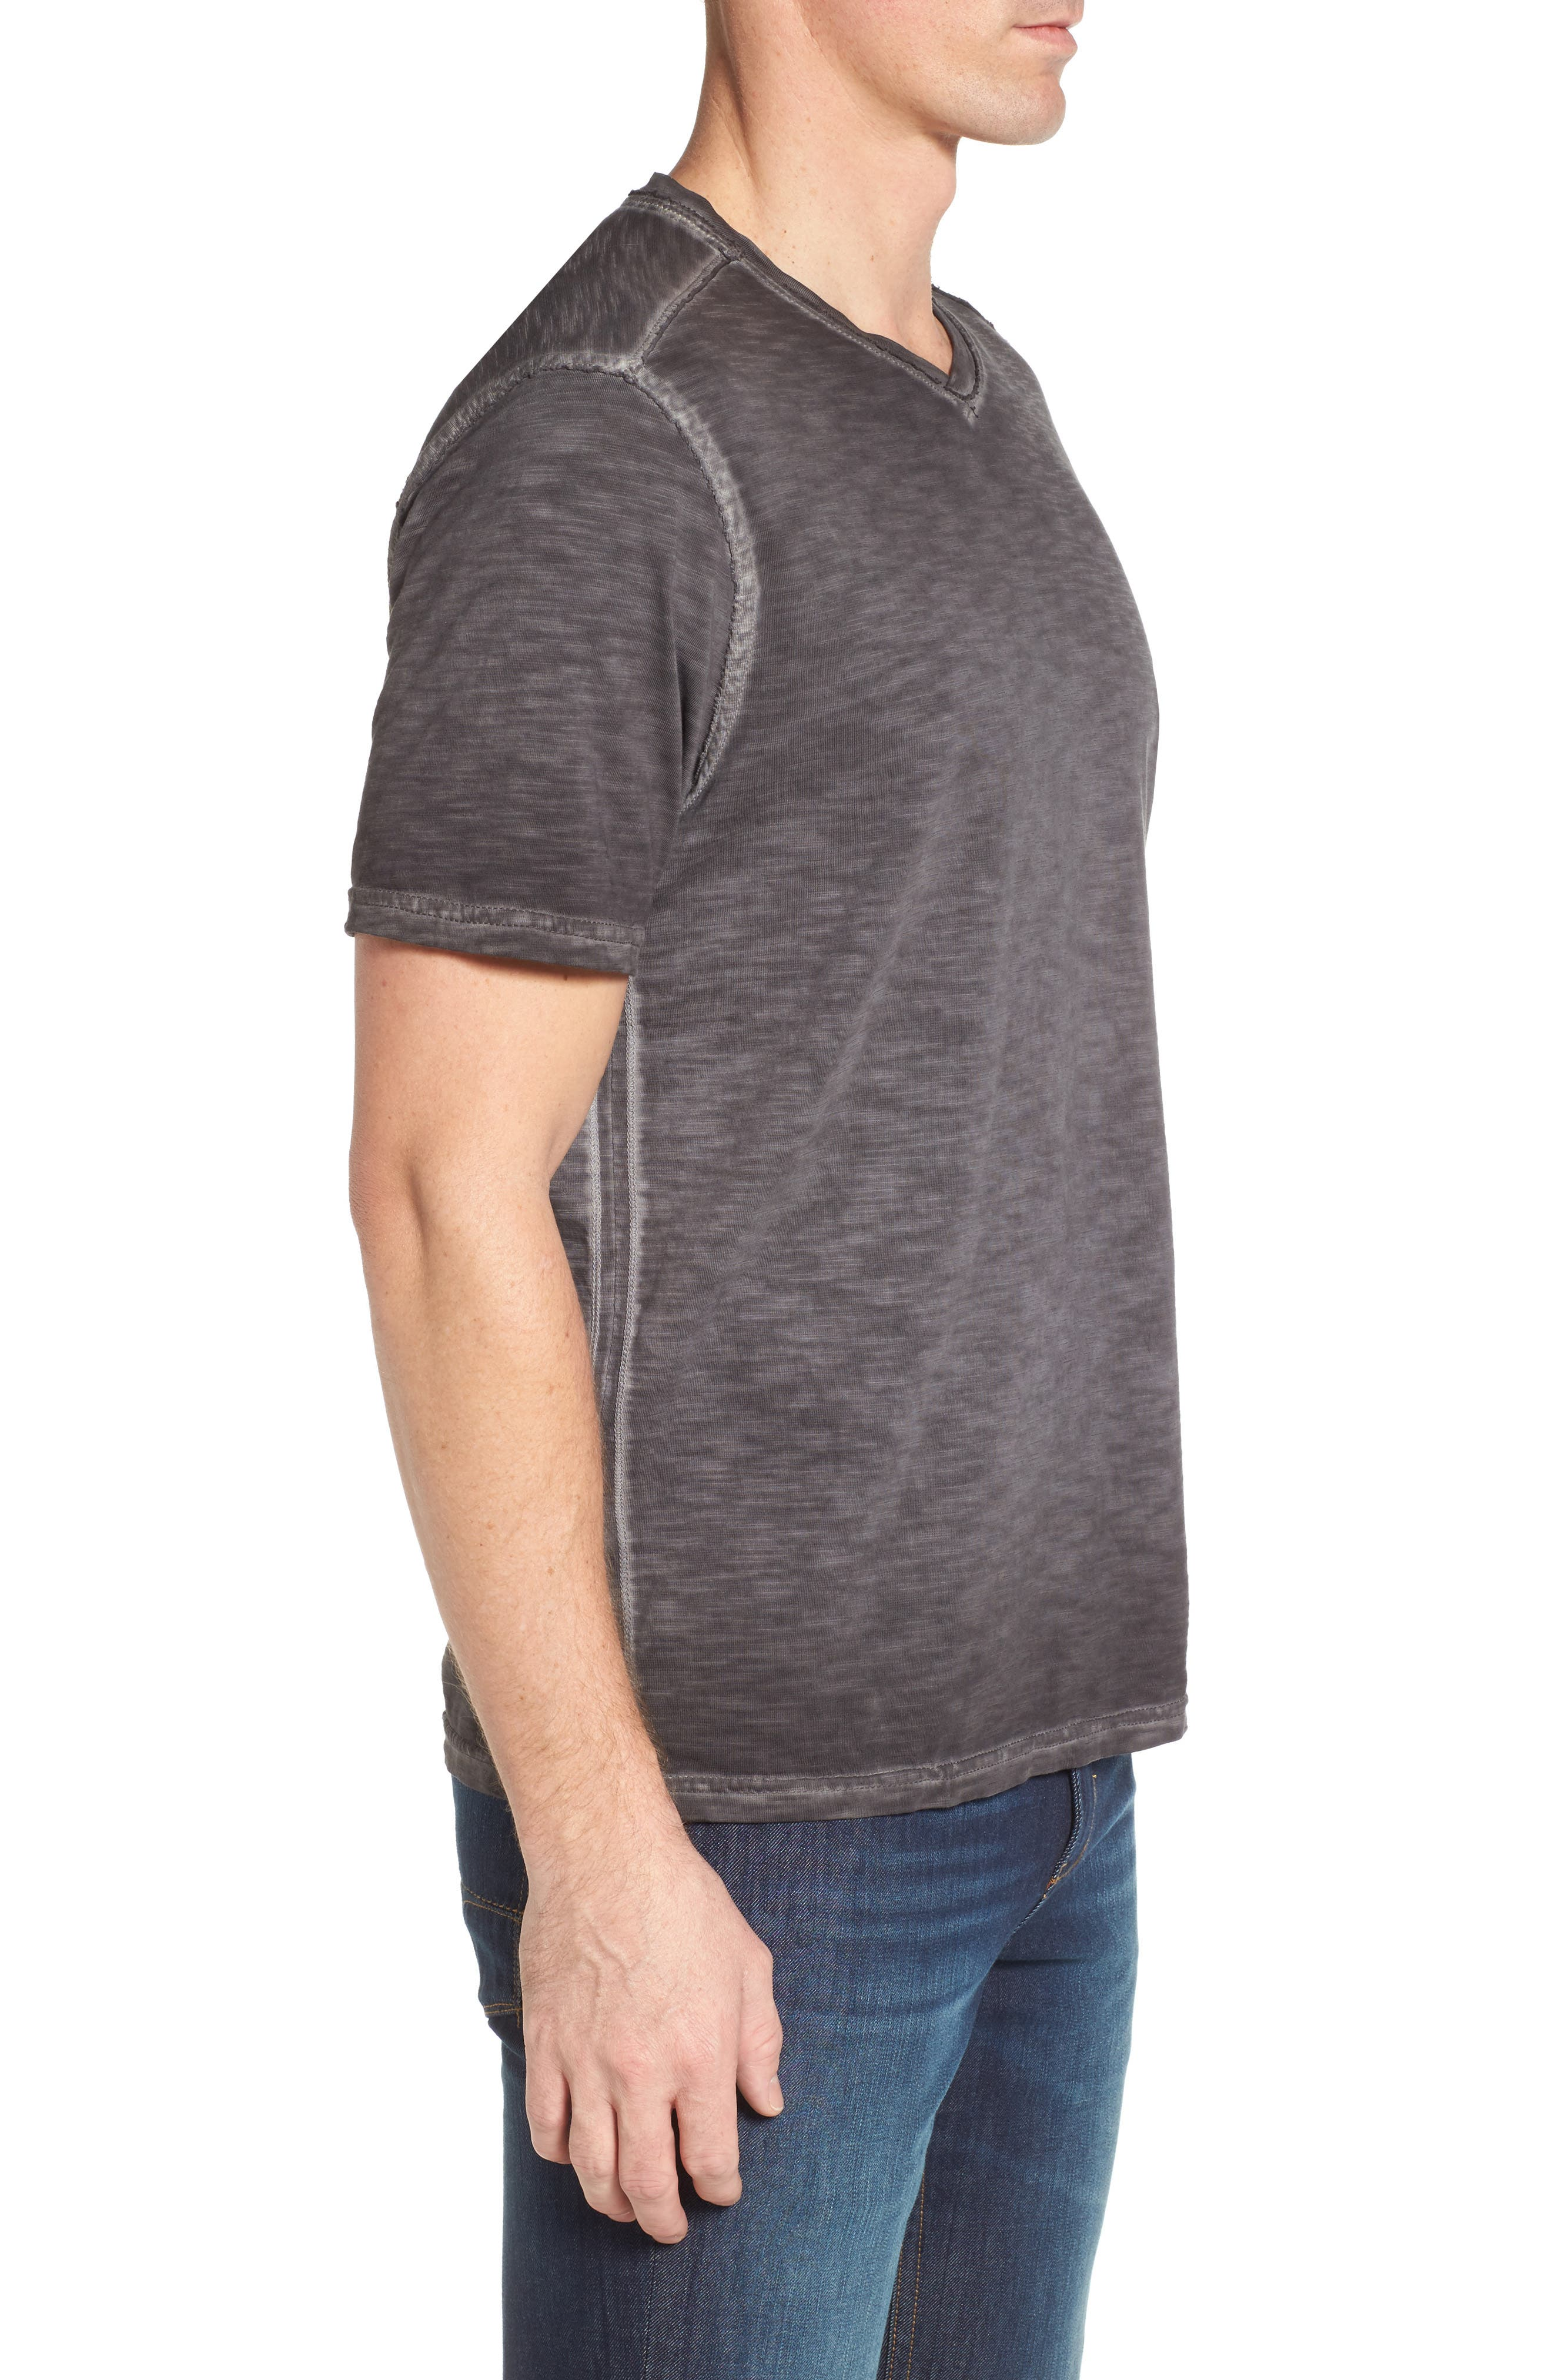 Suncoast Shores V-Neck T-Shirt,                             Alternate thumbnail 3, color,                             001